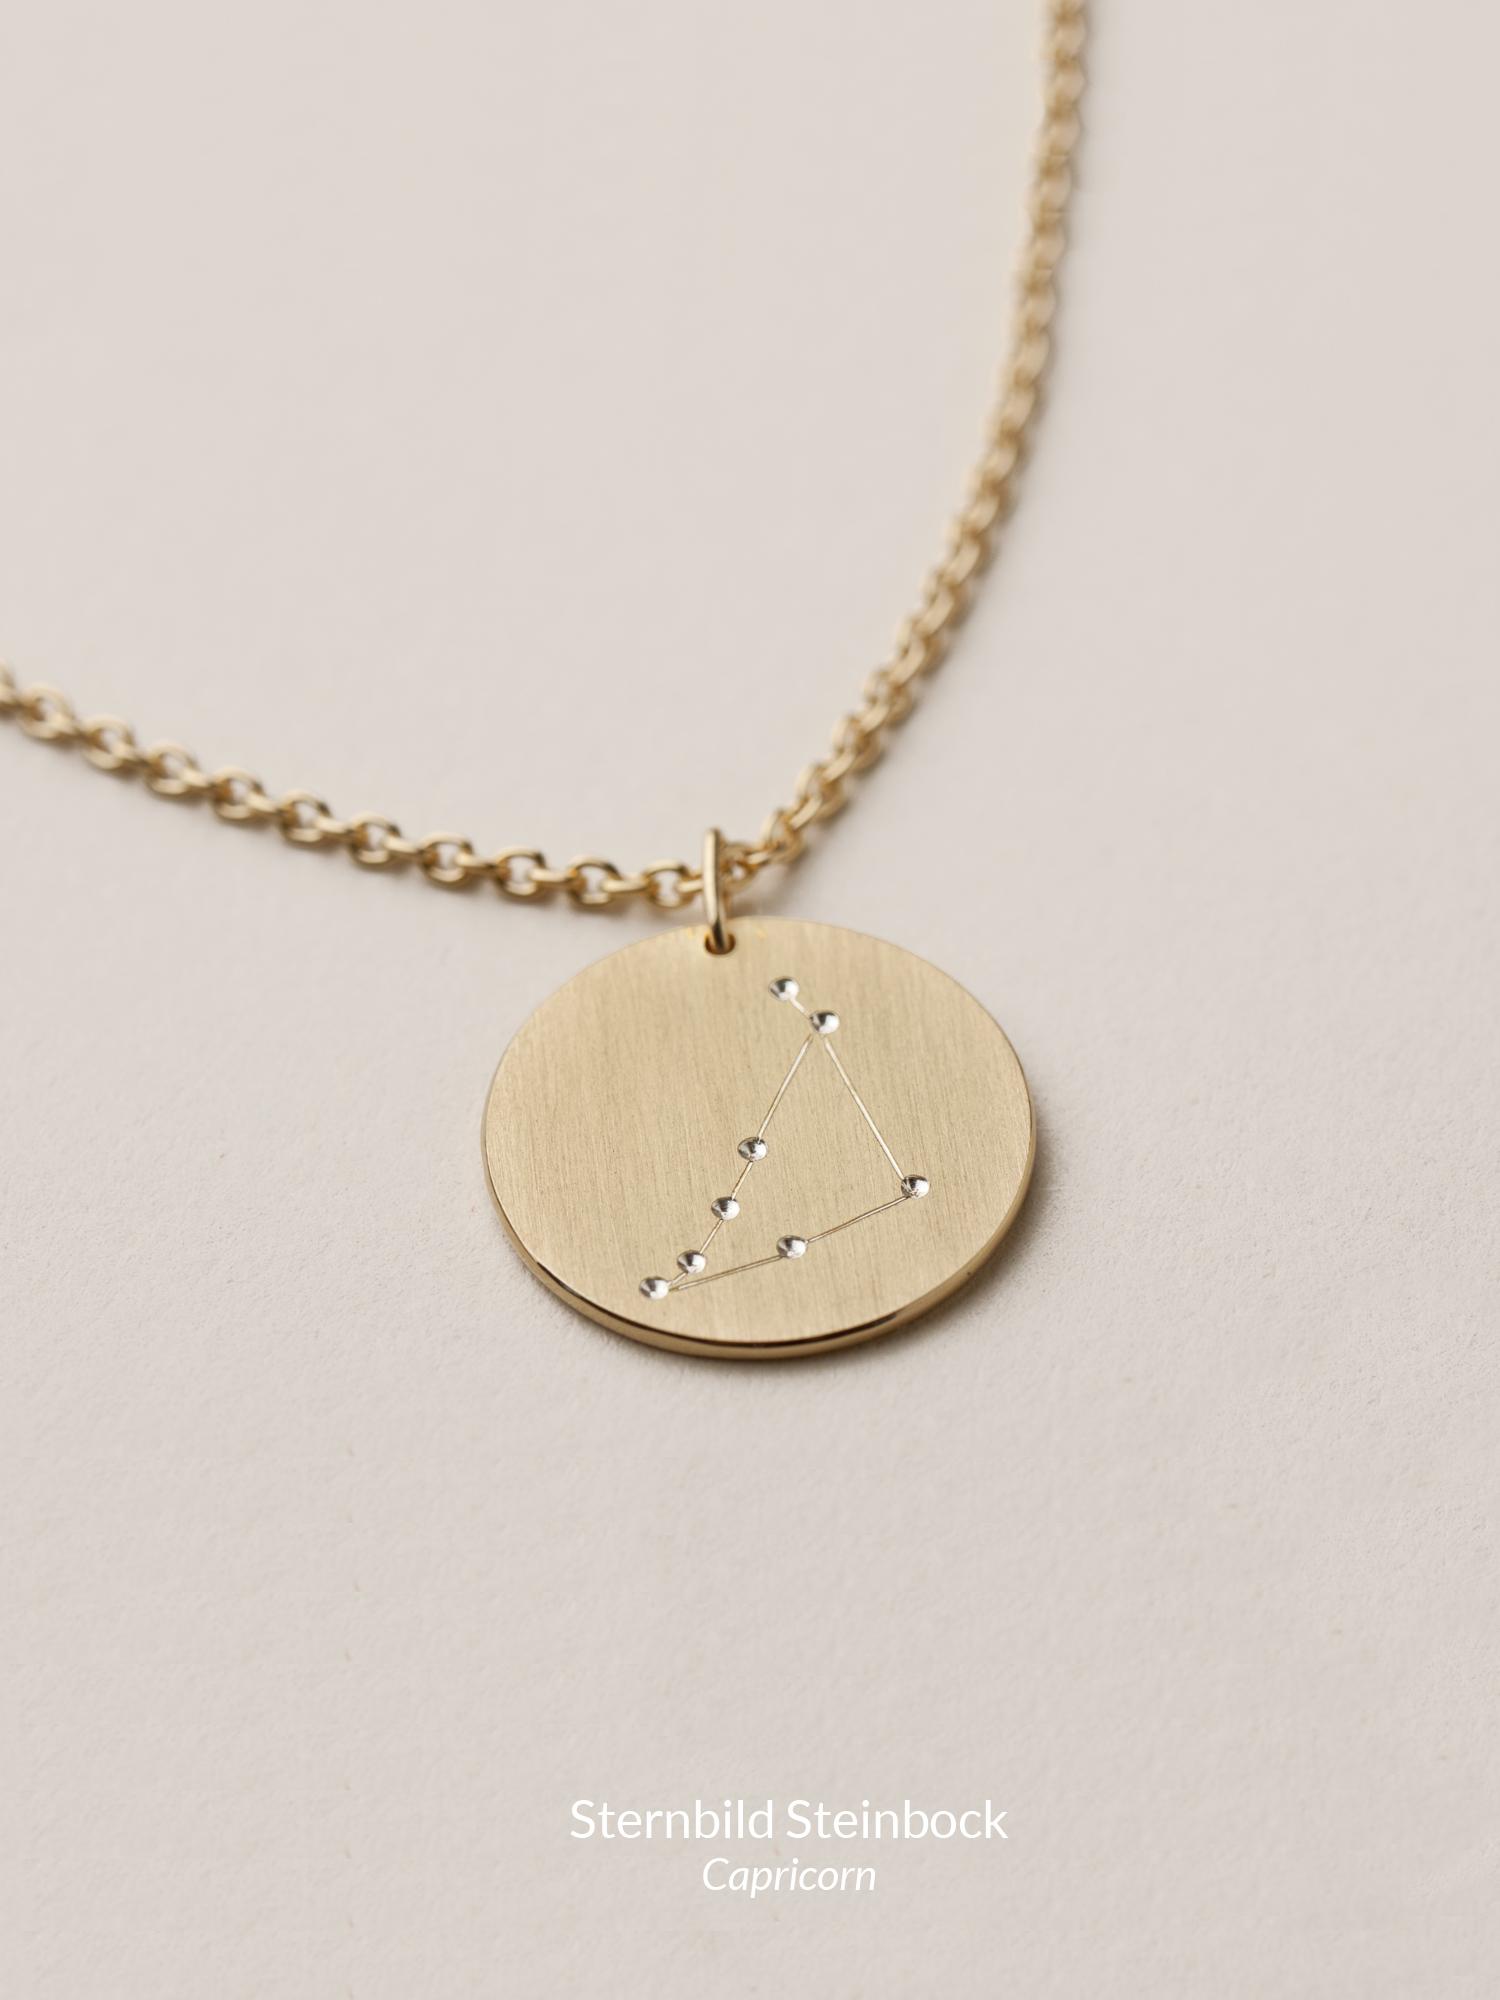 Sternbild Anhänger Steinbock in goldplatiertem Silber  Zodiac sign pendant Capricorn in goldplated silver